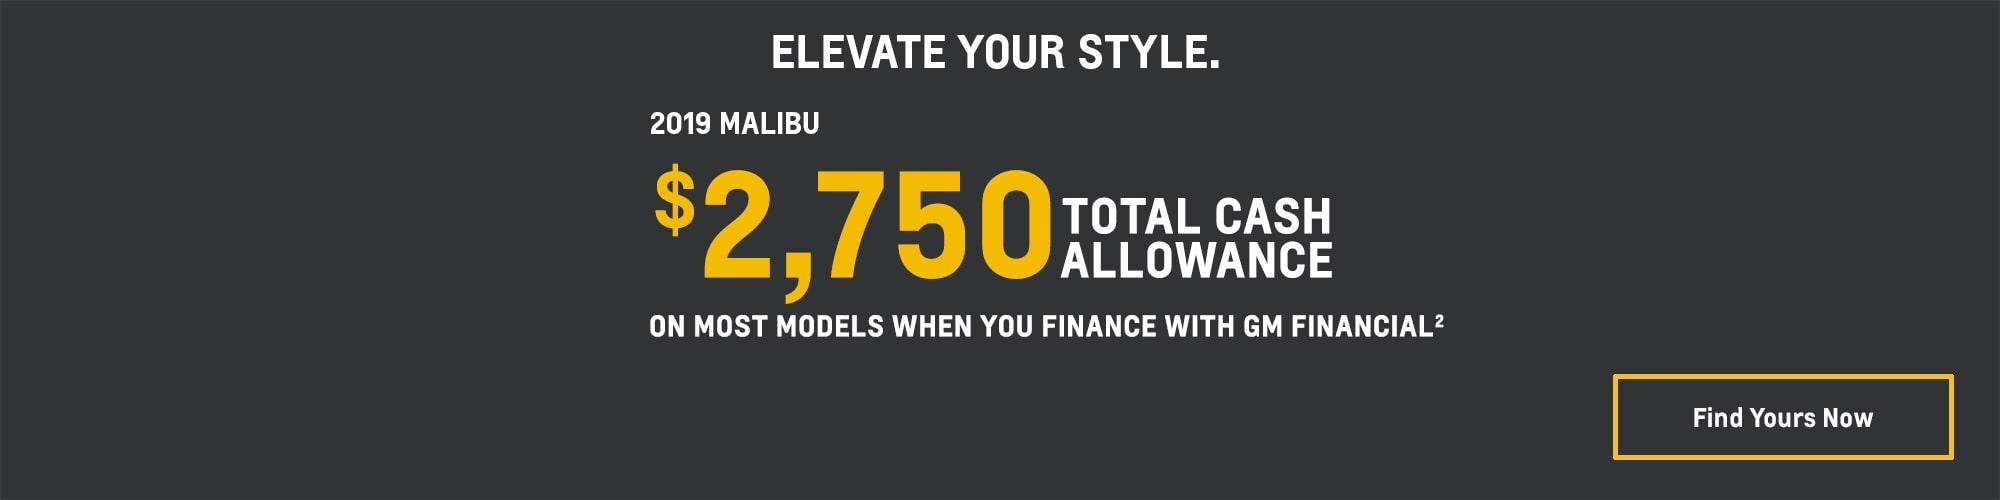 2019 Chevrolet Malibu: $2,750 Total Cash Allowance